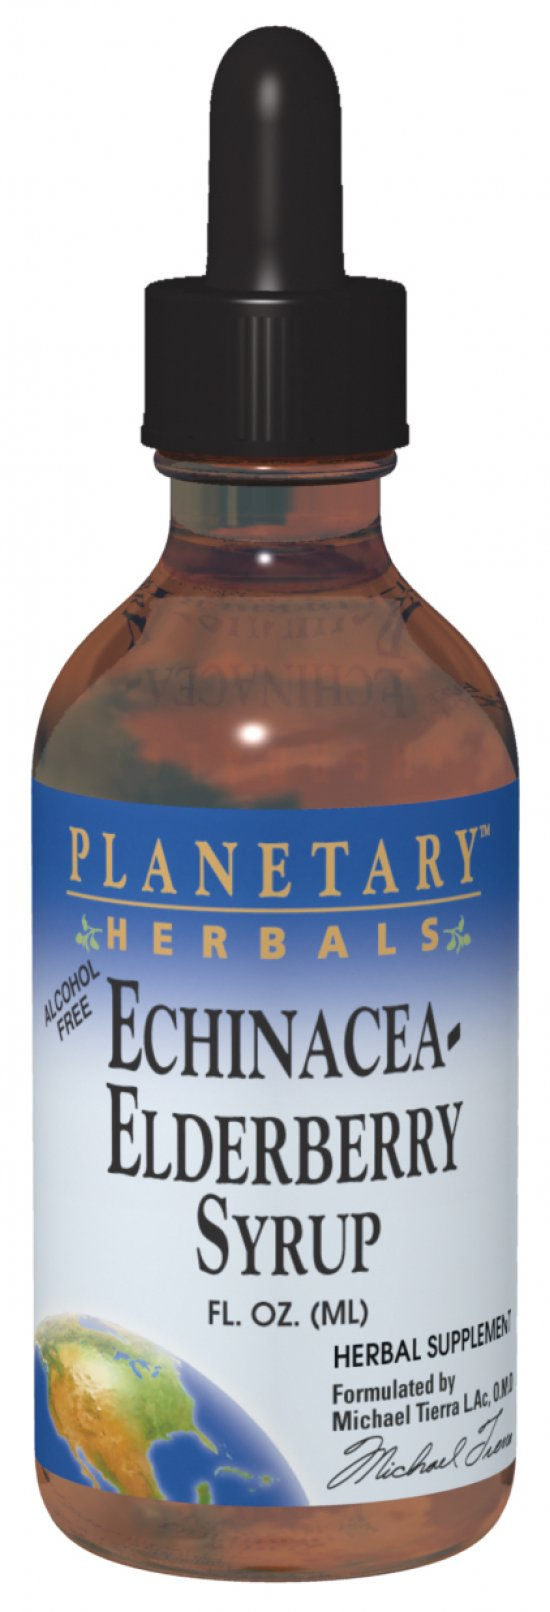 PLANETARY HERBALS: Echinacea-Elderberry Syrup 2 fl oz